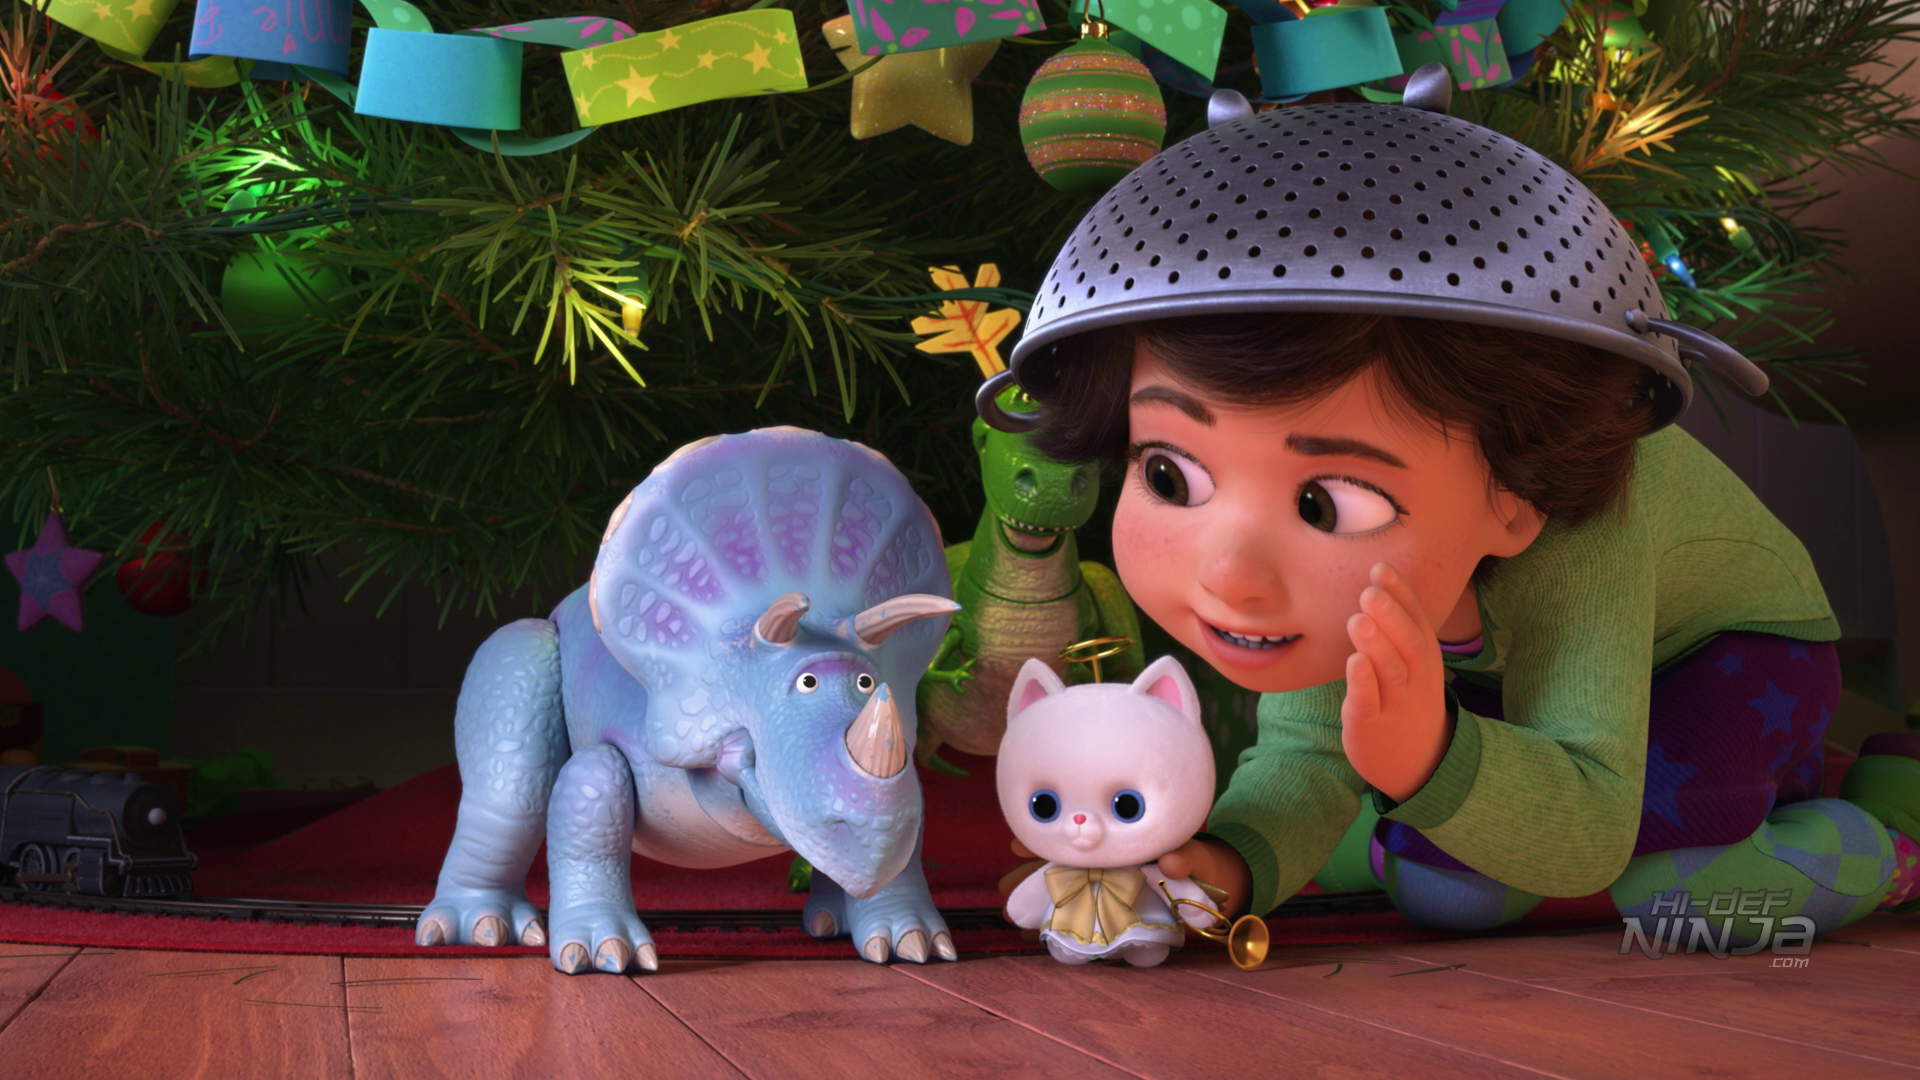 Toy-Story-Time-Forgot-HiDefNinja (2)